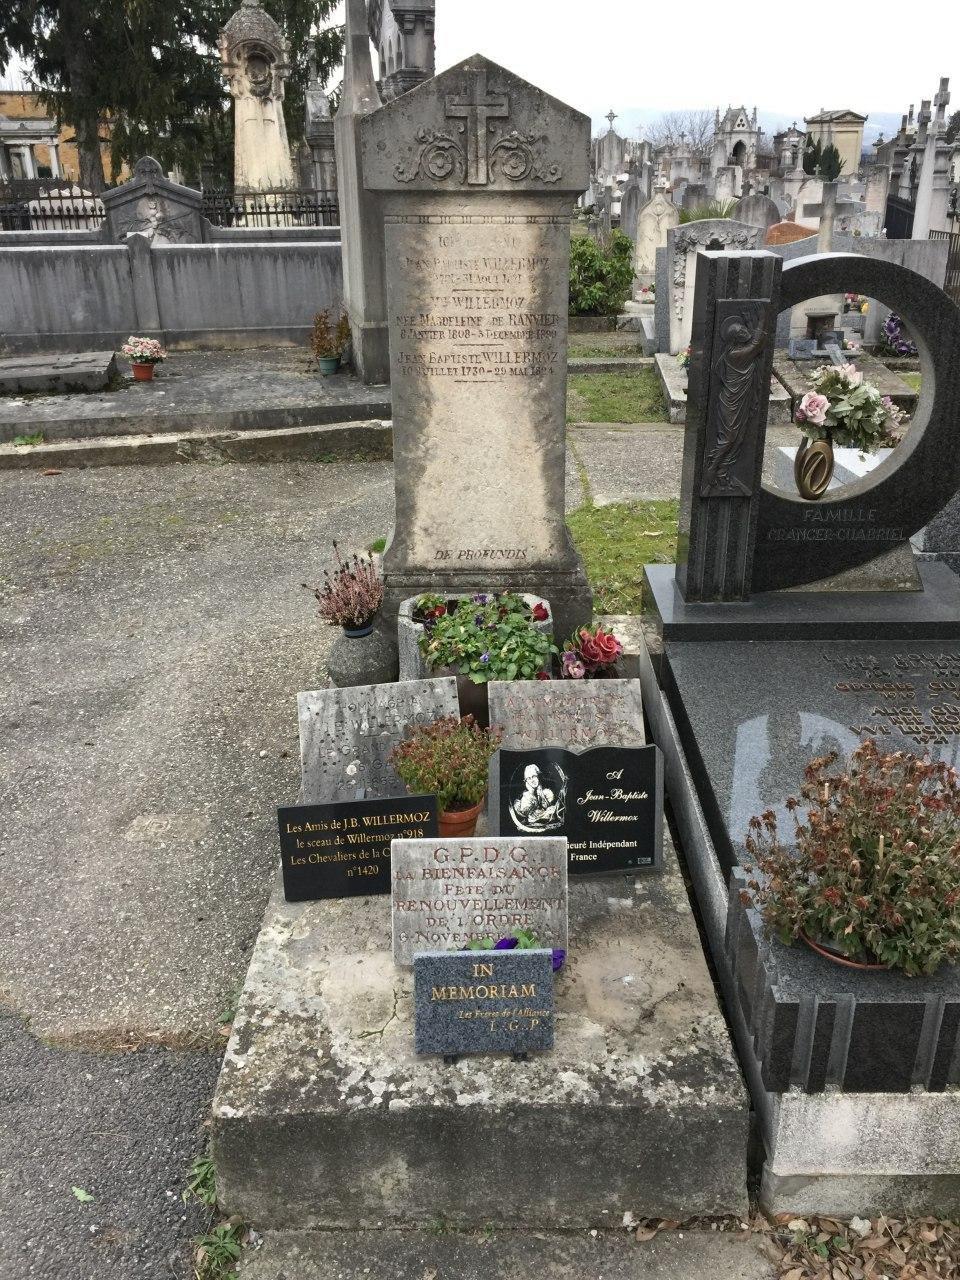 29 мая 1824 года в Лионе умер Жан-Батист Виллермоз